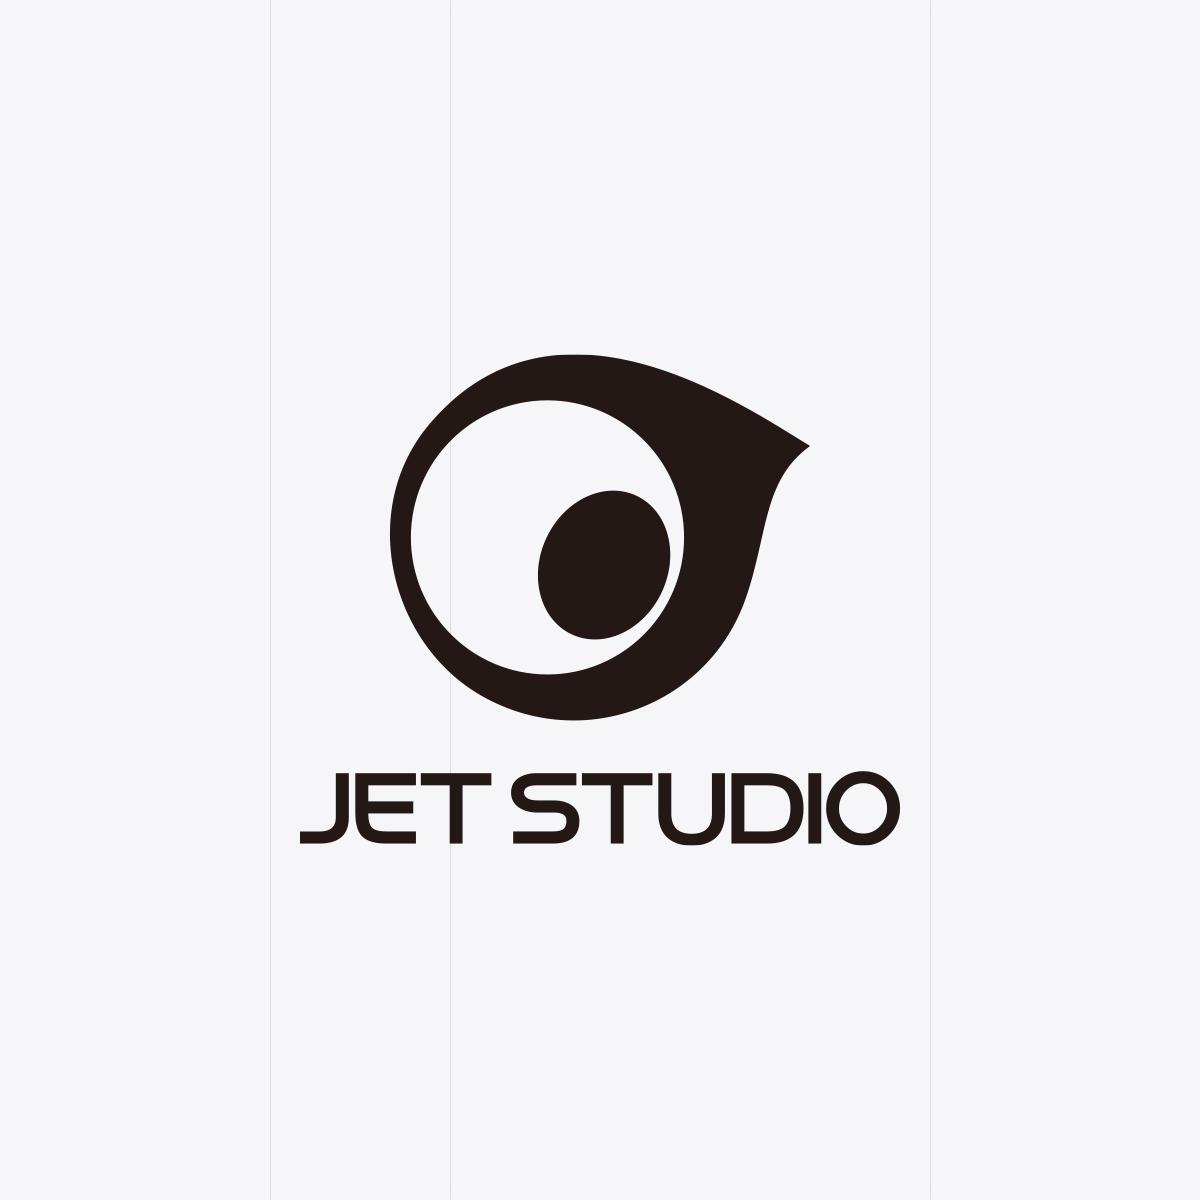 JET STUDIO :: 株式会社ジェットスタジオ